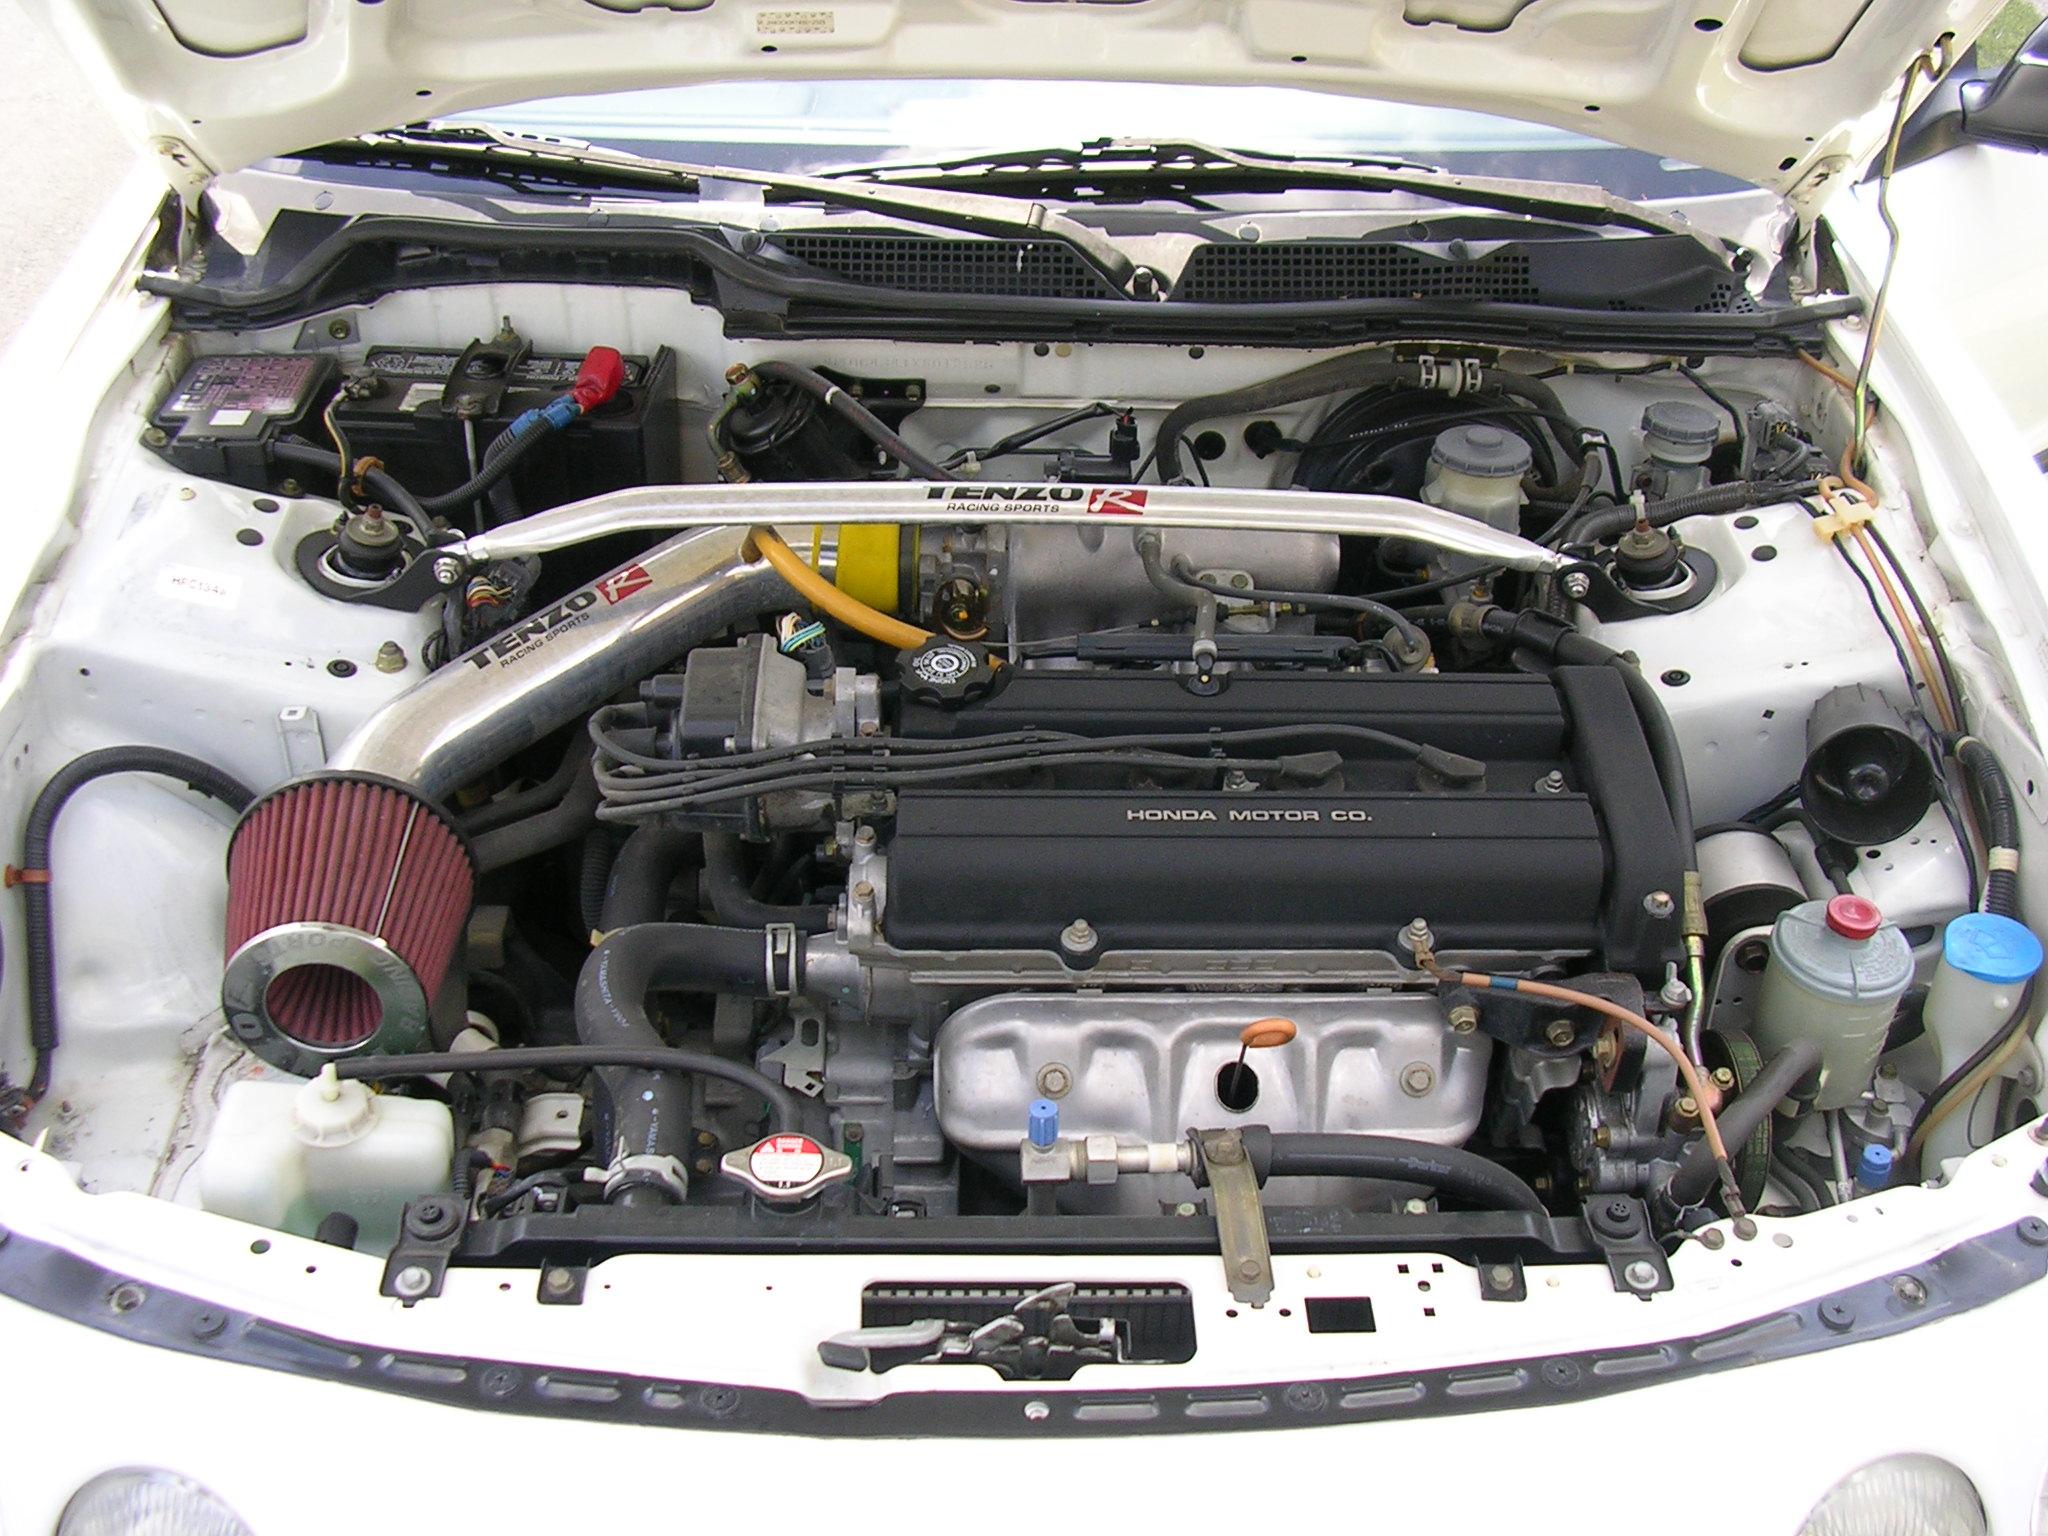 Fileb18b1 Engine Rs 1999 Wikimedia Commons Honda Prelude